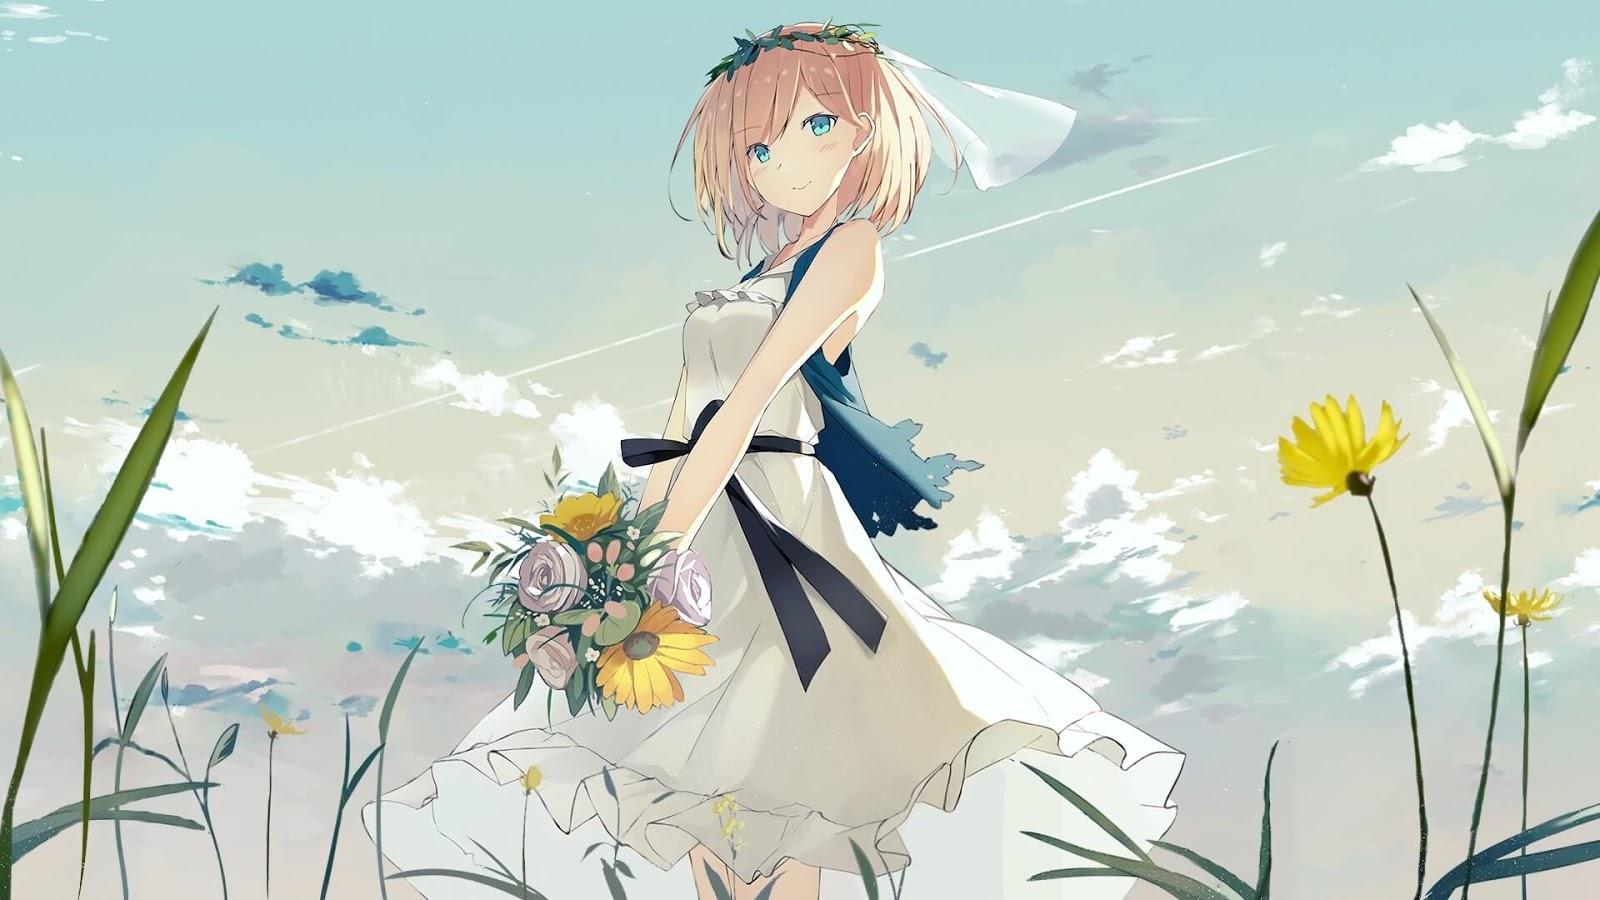 Flower and Girl [Wallpaper Engine Anime]